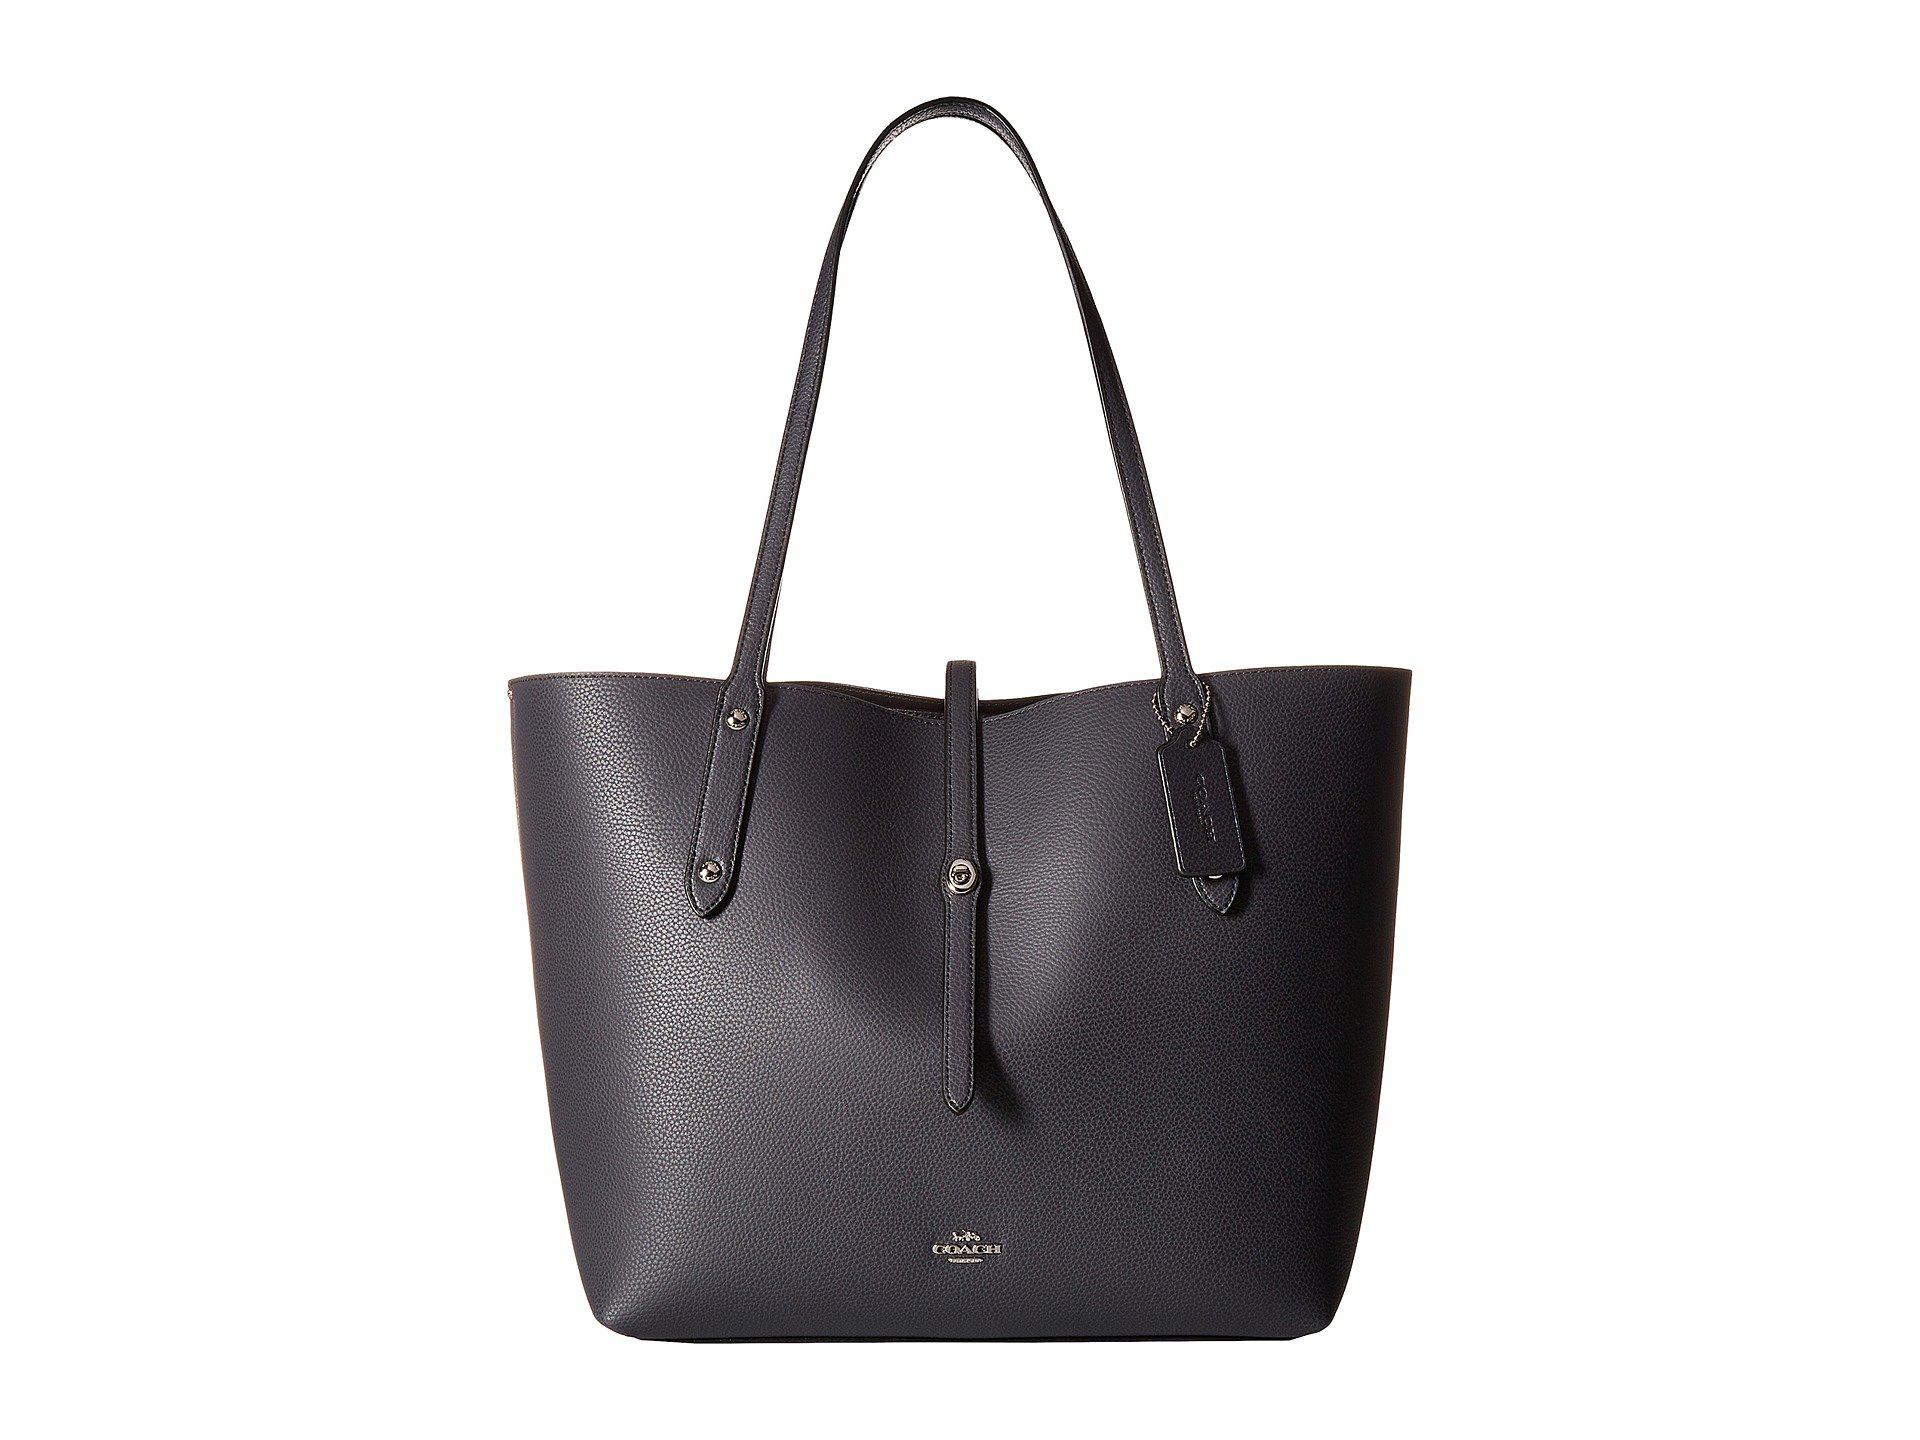 317e2b57aeae4 COACH. Women s Blue Polished Pebbled Leather Market Tote (li black true Red)  Handbags